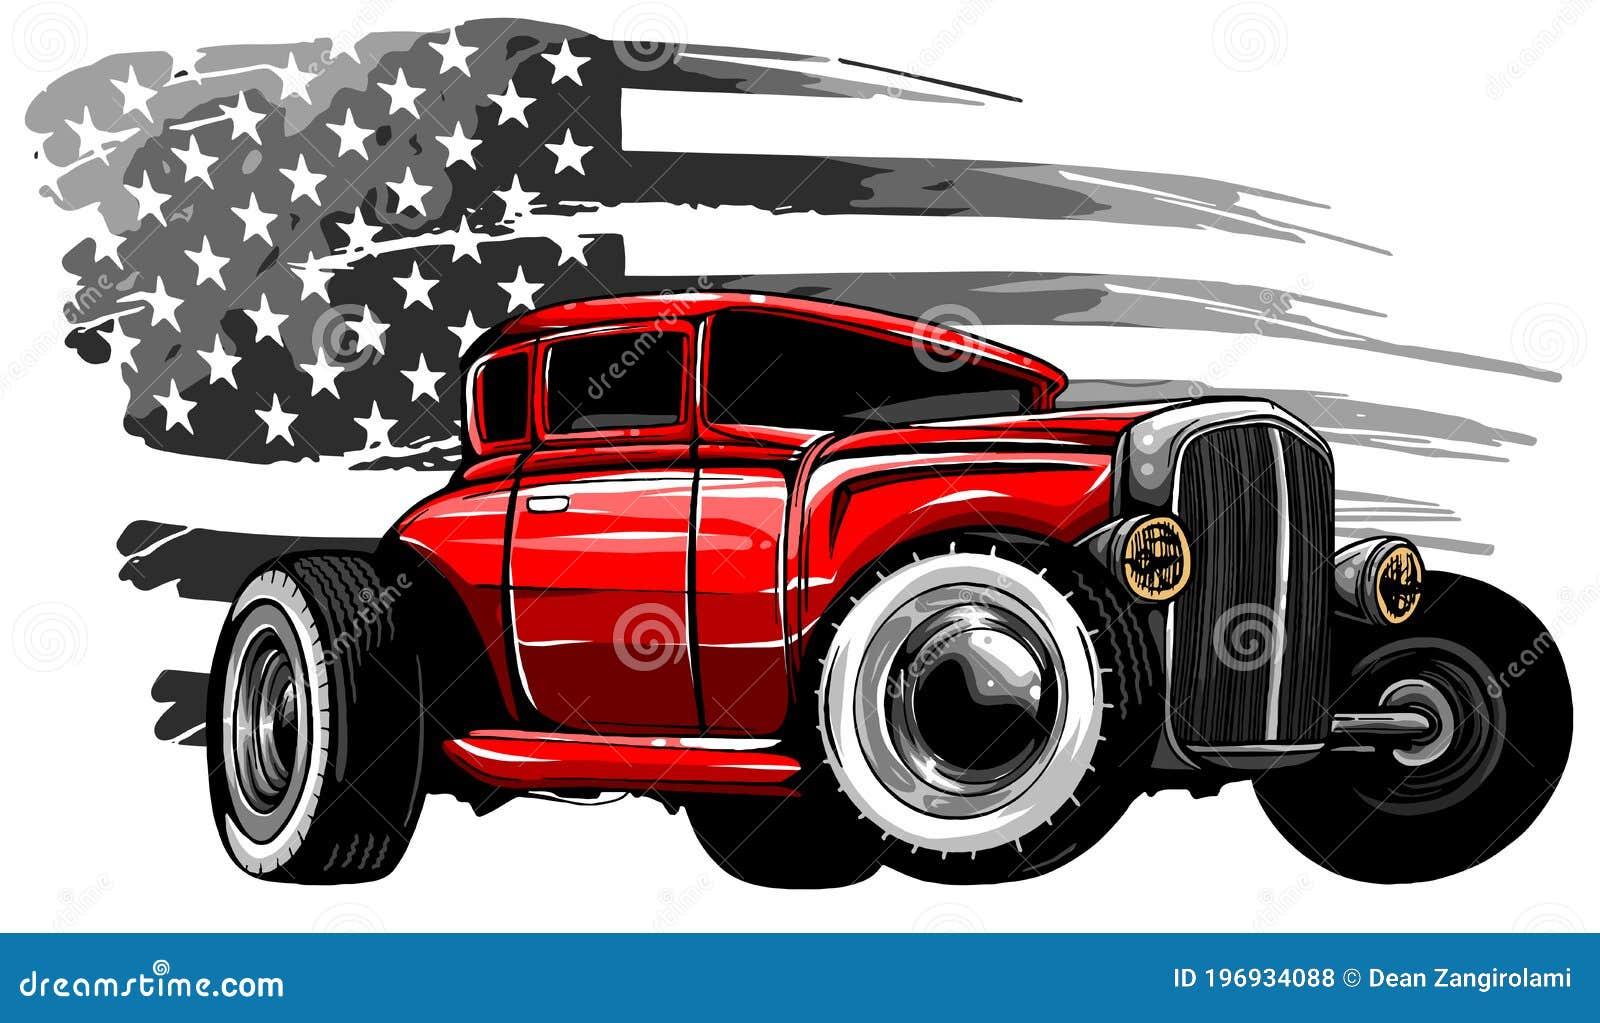 Bmx Jump Illustrations, Royalty-Free Vector Graphics